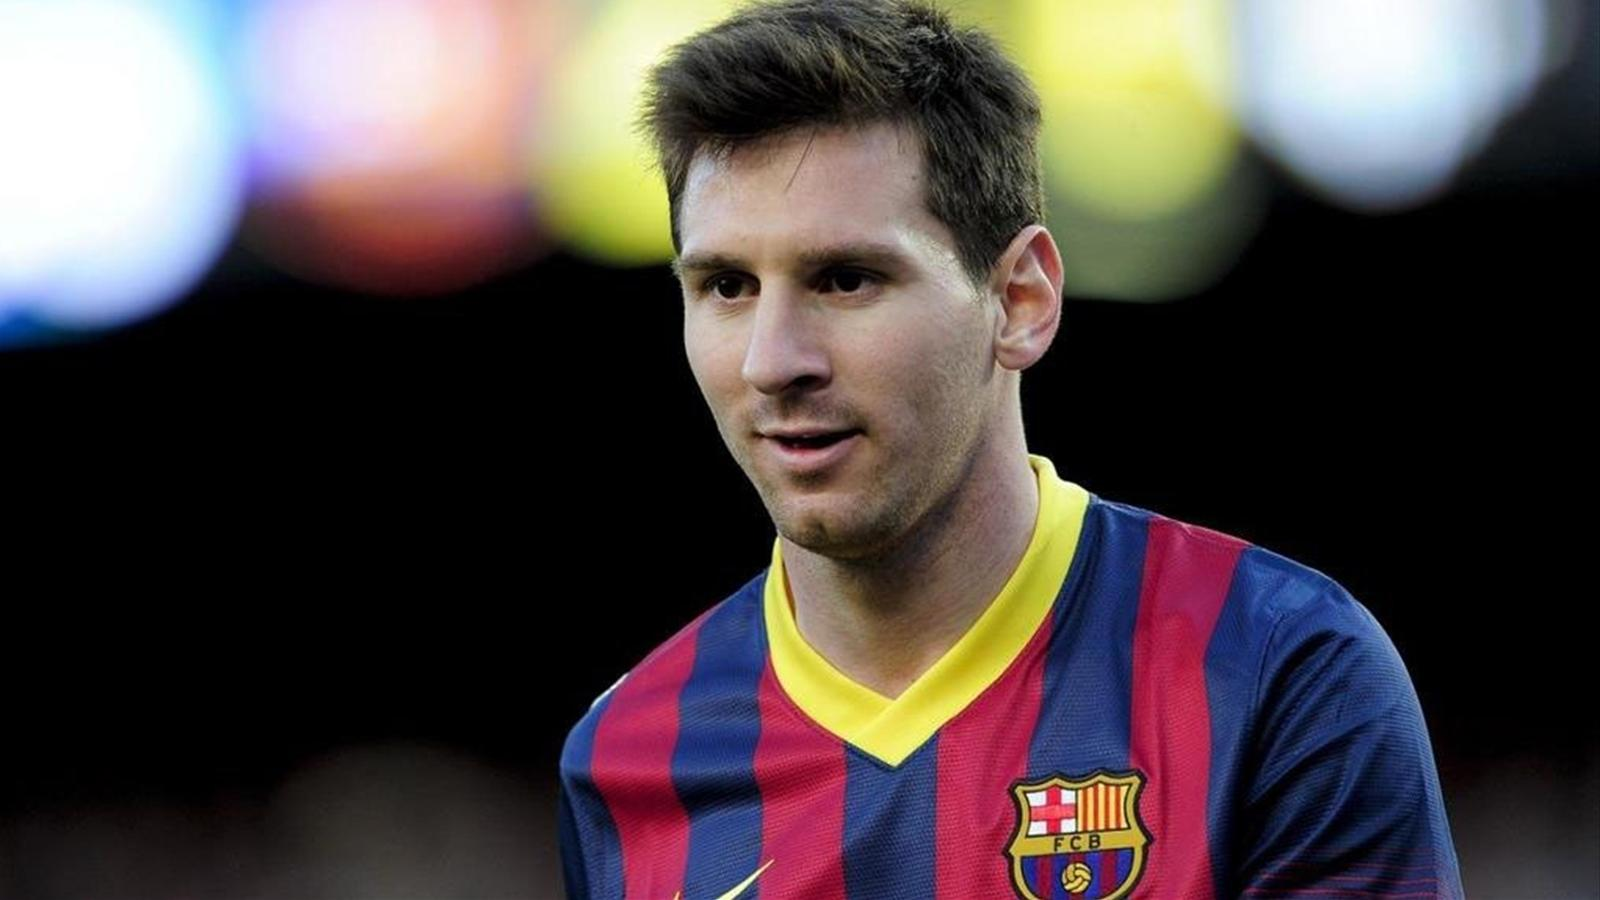 Lionel Messi will retire at Barca, says president - Liga 2011-2012 - Football - Eurosport